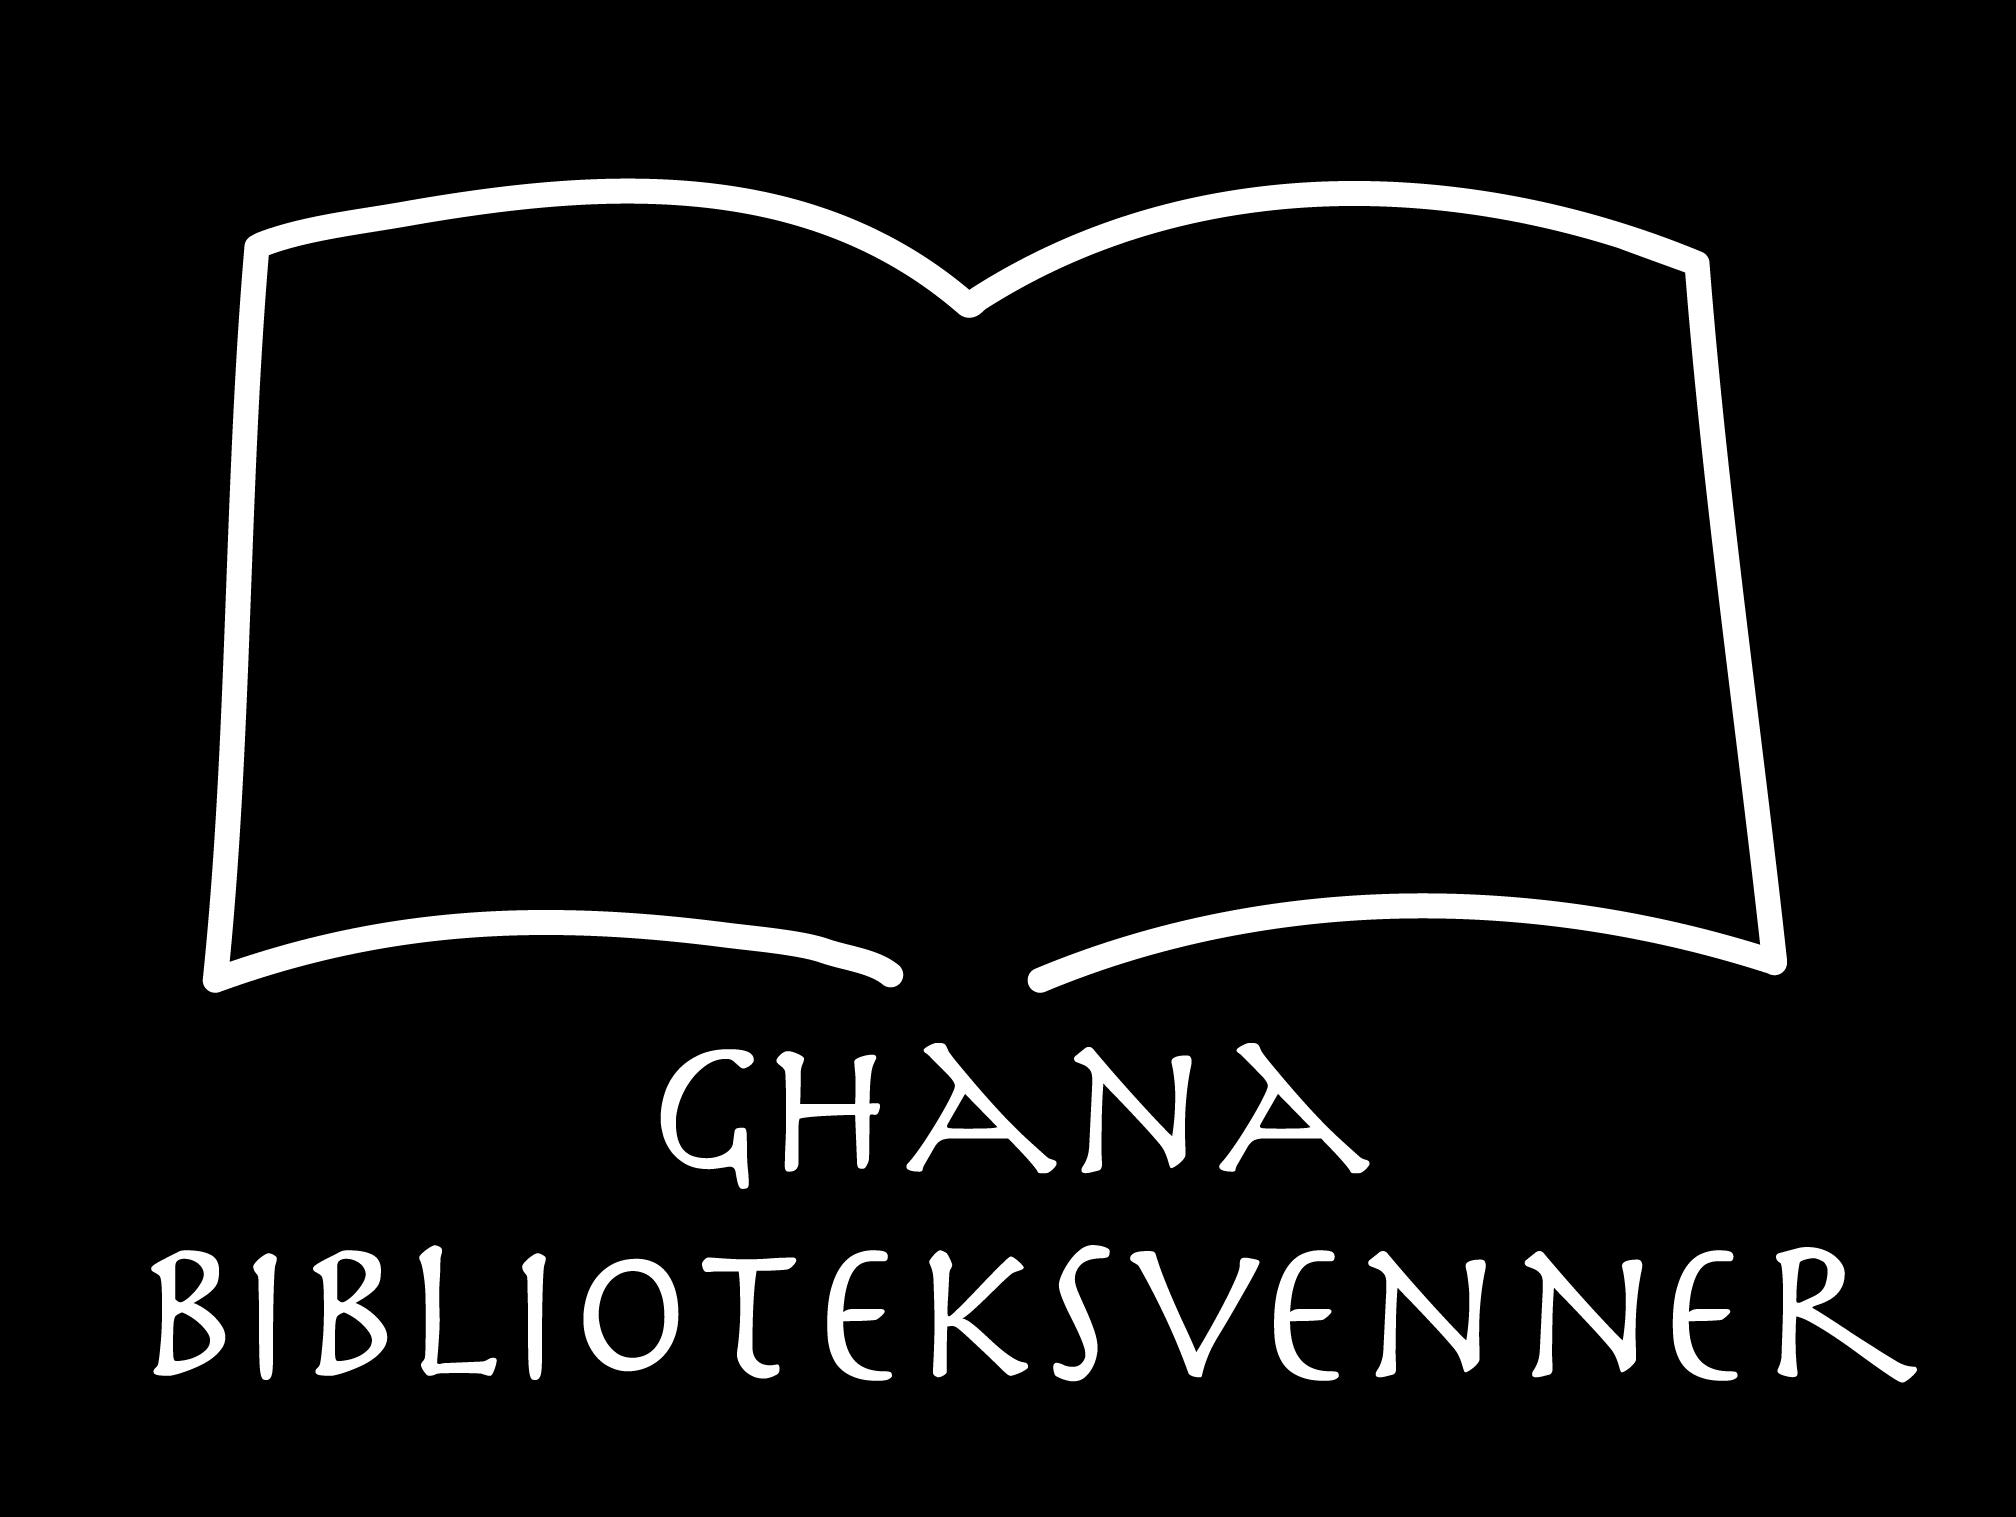 Ghana Biblioteksvenner